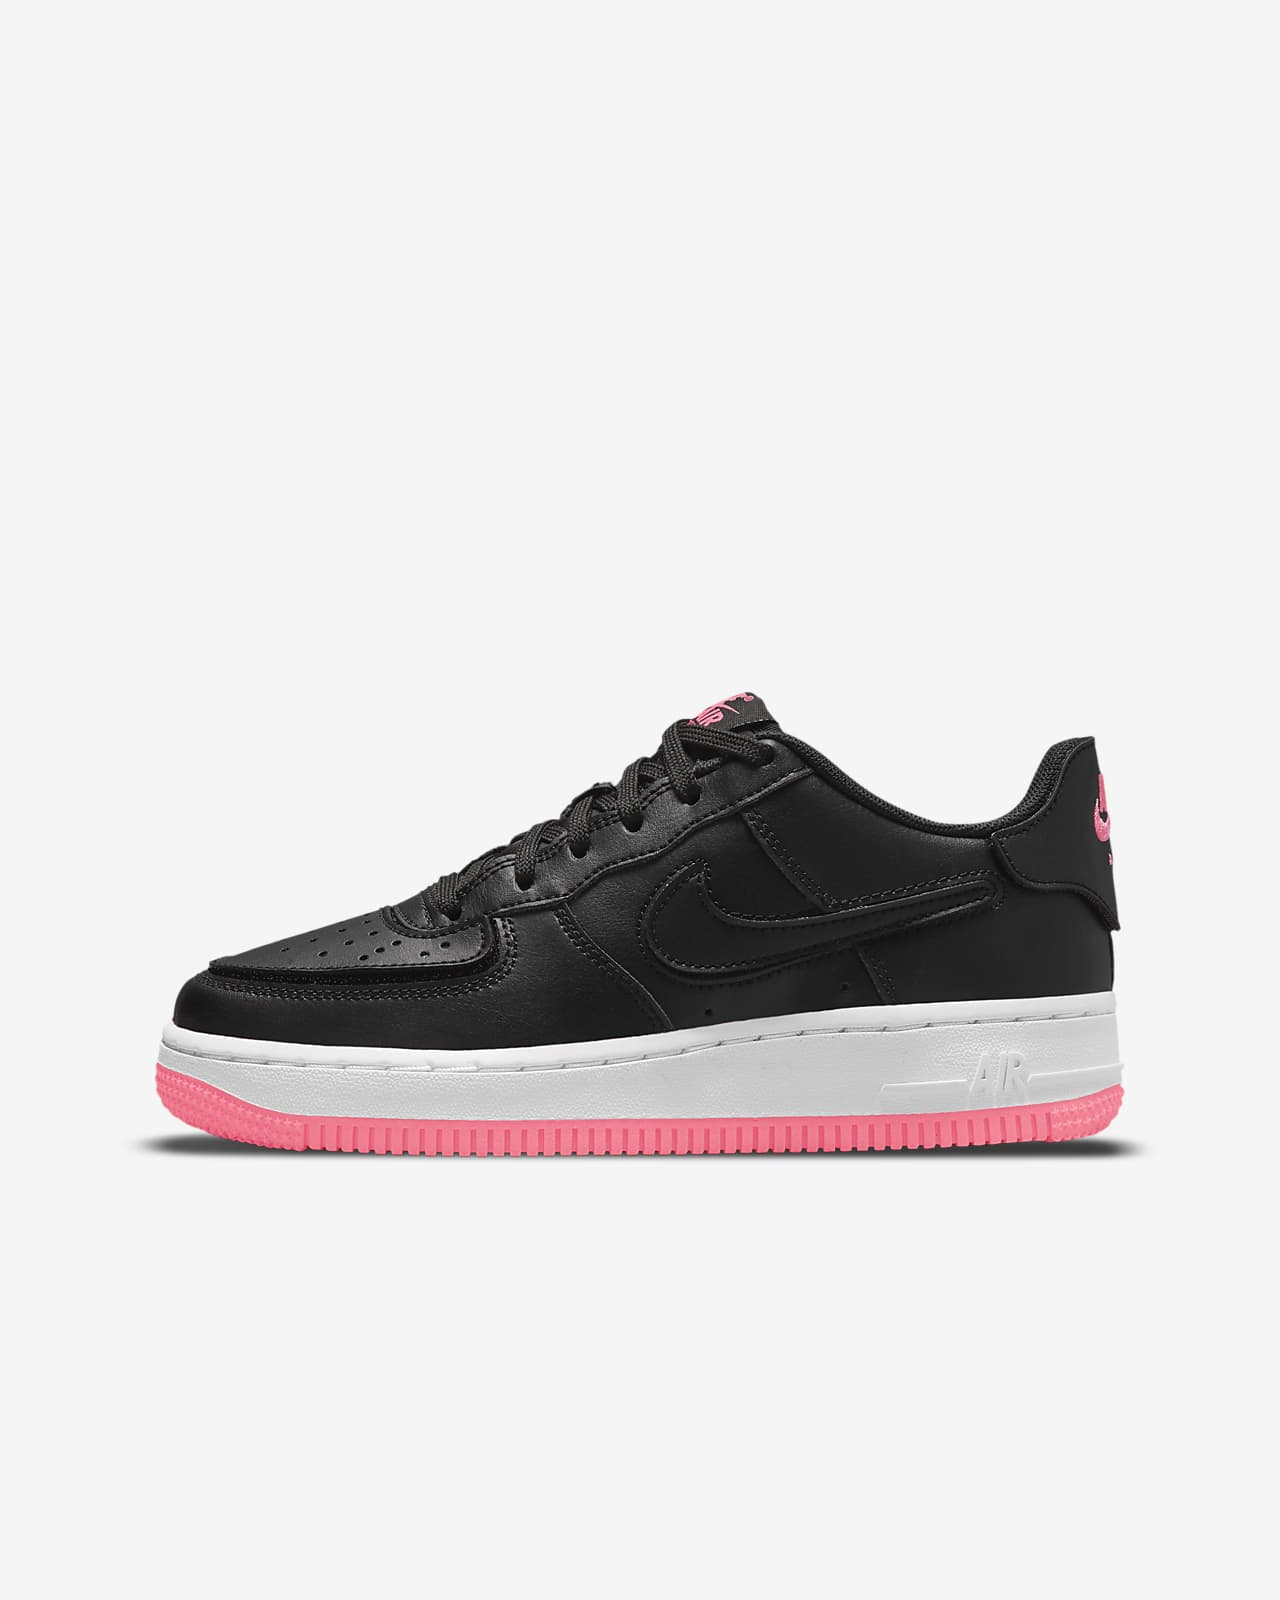 Nike Air Force 1/1 Kinderschoen